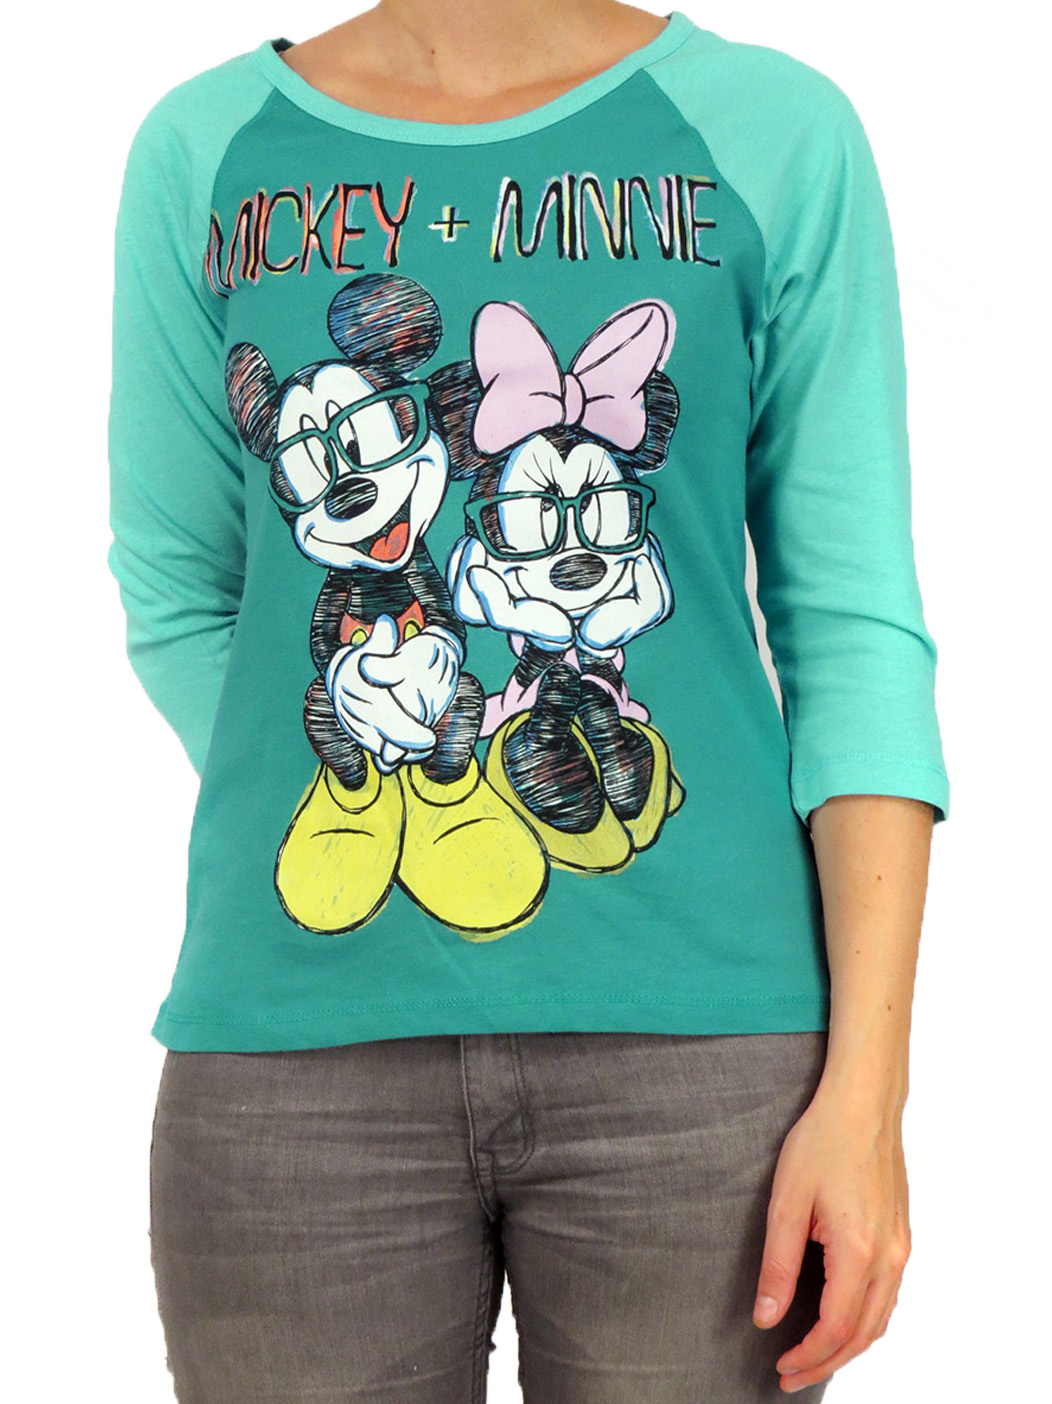 Disney Mickey & Minnie Mouse Sketch Teal 3/4 Sleeve Juniors Raglan T-Shirt Top at Sears.com